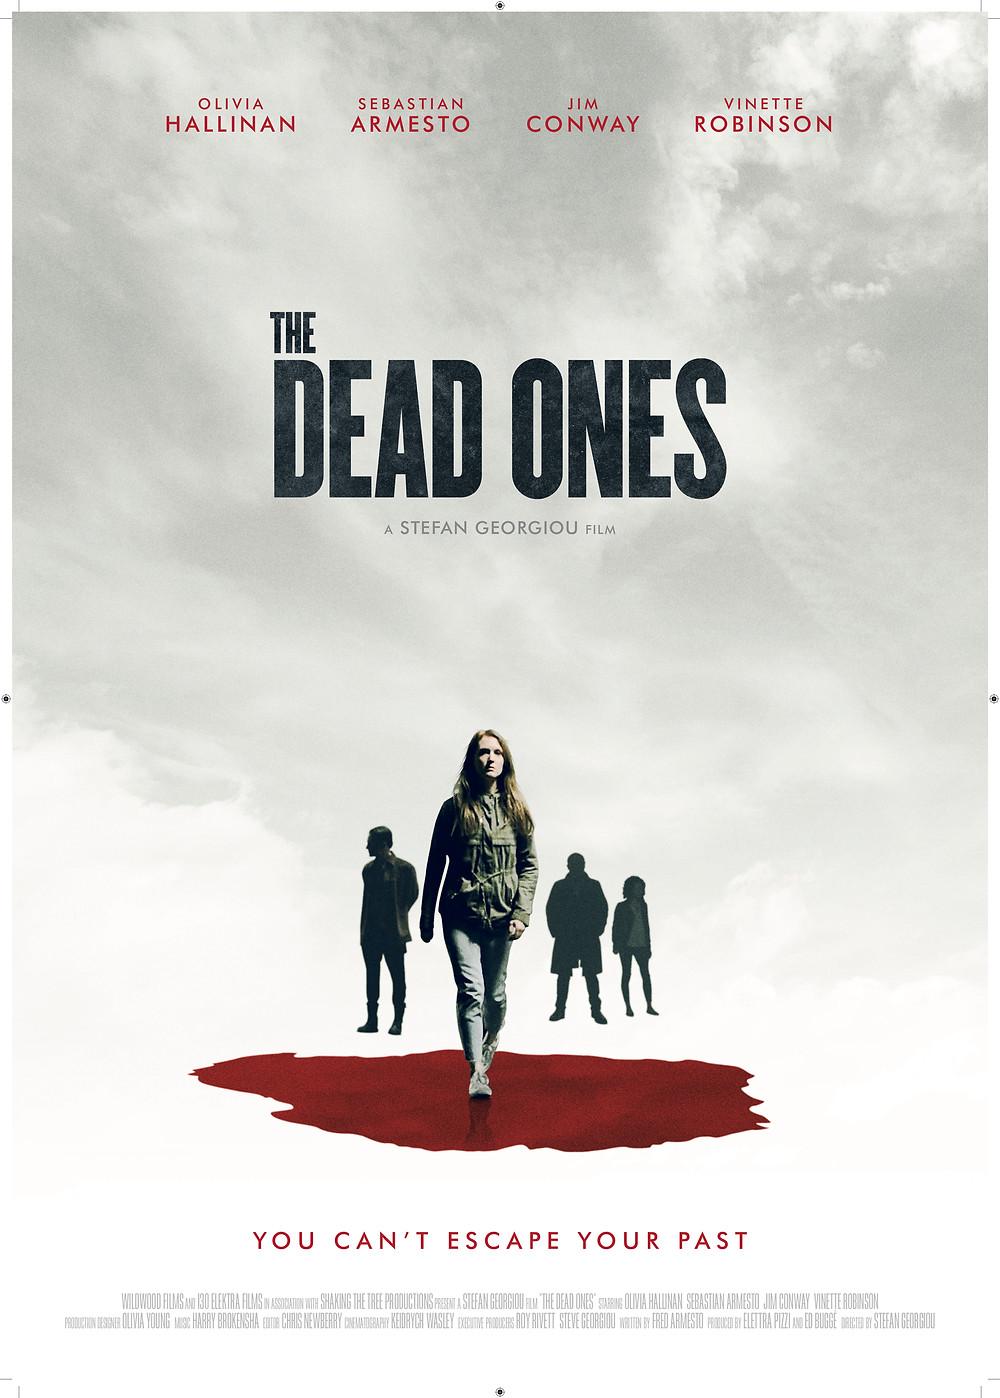 The Dead Ones short film poster